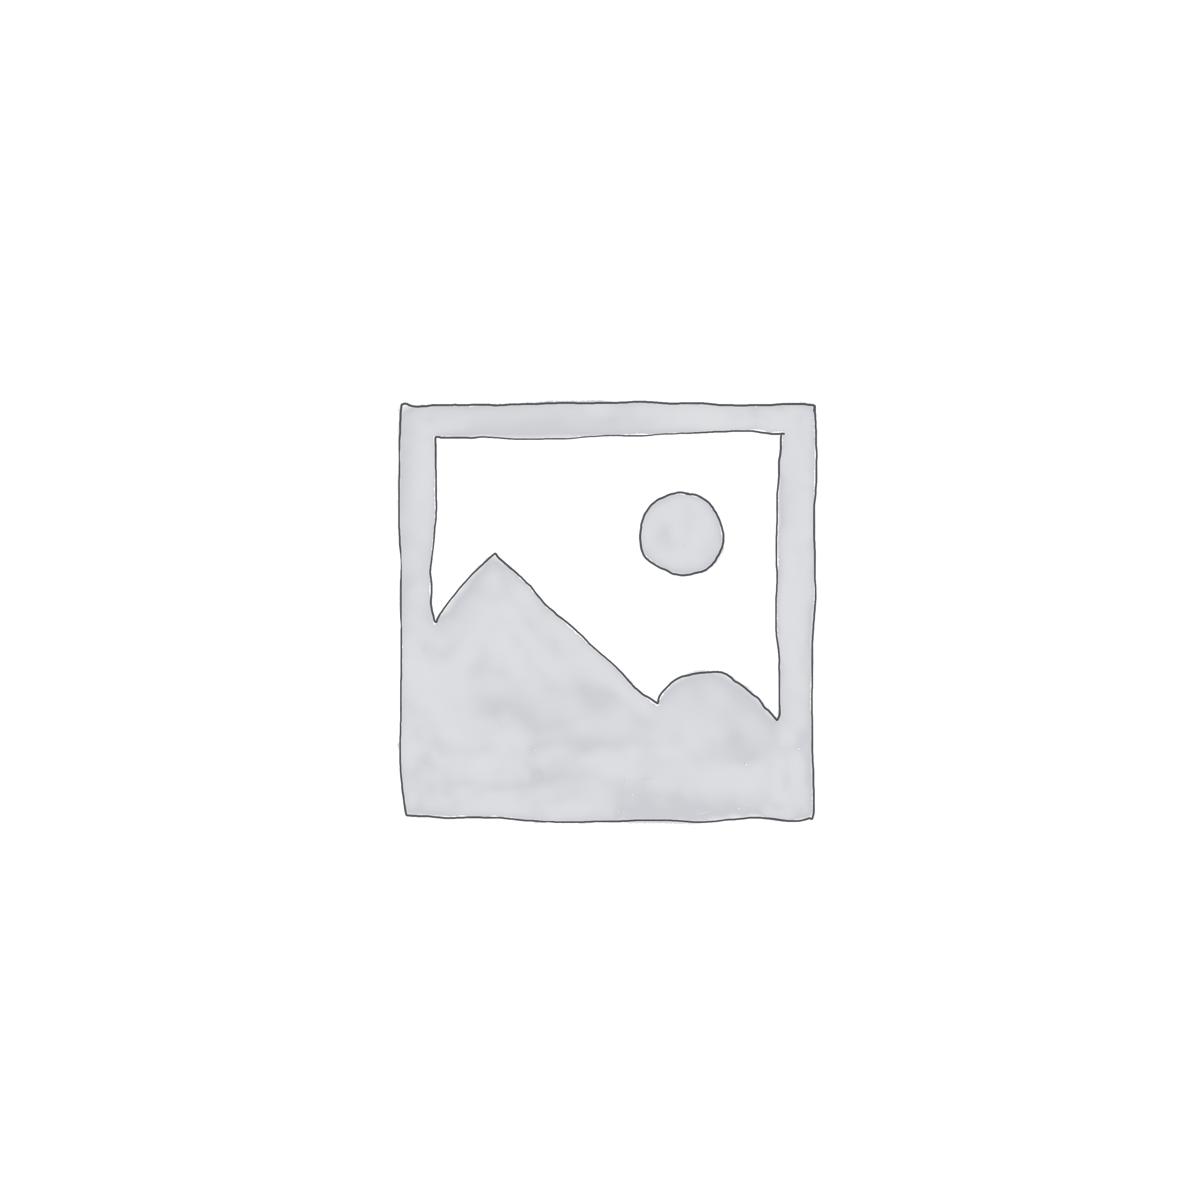 woocommerce placeholder 1 - woocommerce-placeholder